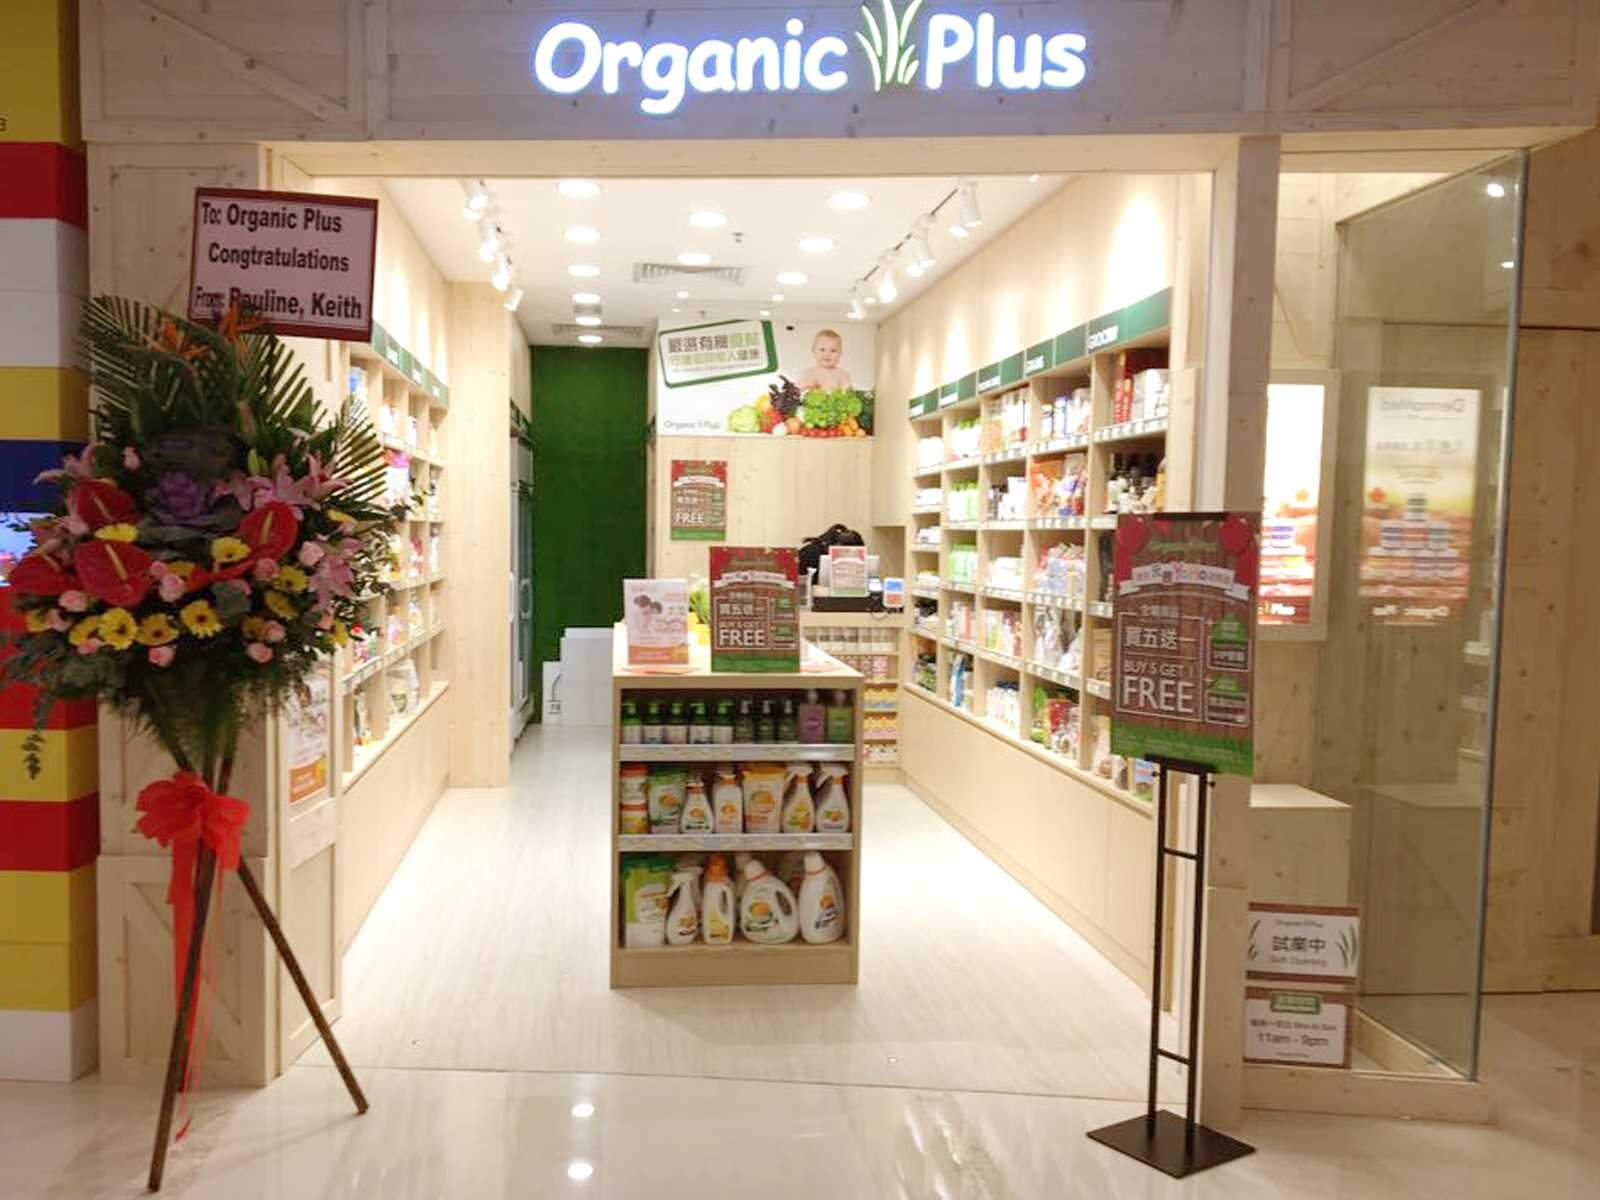 Organic Plus   Yoho Shop  Business Hours:11am-9pm Mobile:24430020/24430019 Email:yl@organicplus.com.hk Address:Shop. No. A253A, On, Level 2, yoho Mall II,  Yuen Long, NT.